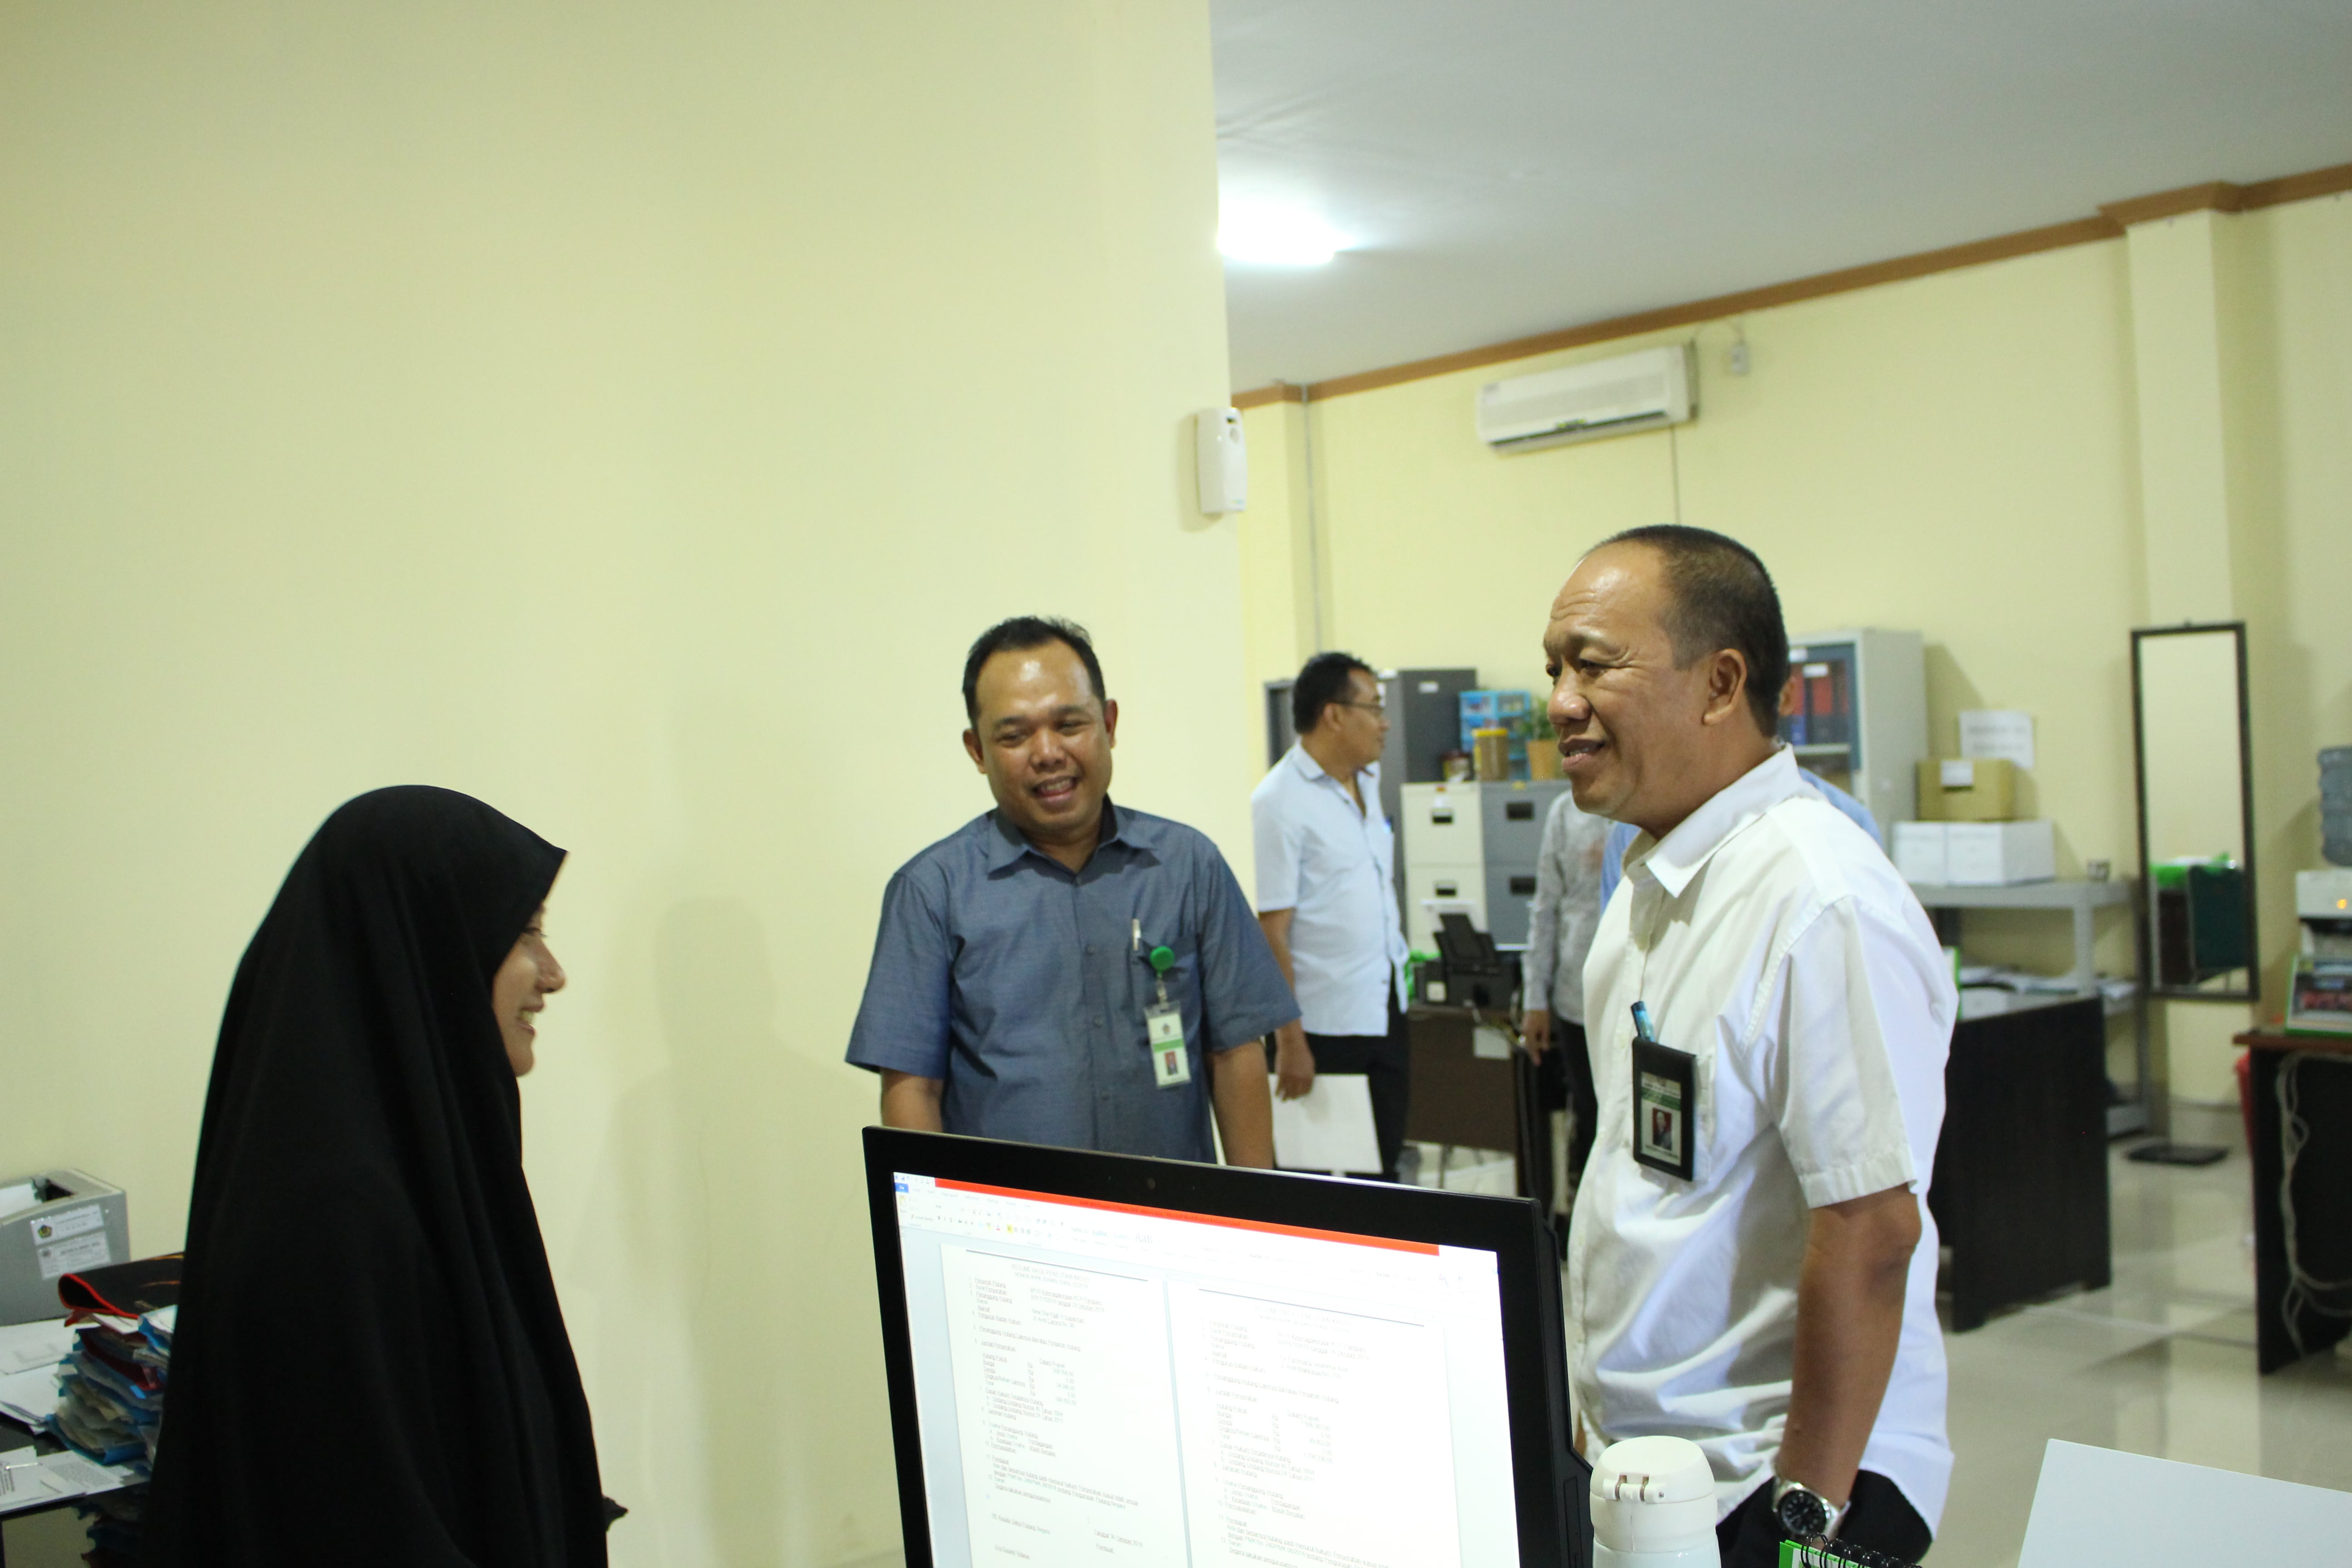 Kunjungan Kerja dan Pembinaan Kepala Kanwil DJKN Sulseltrabar